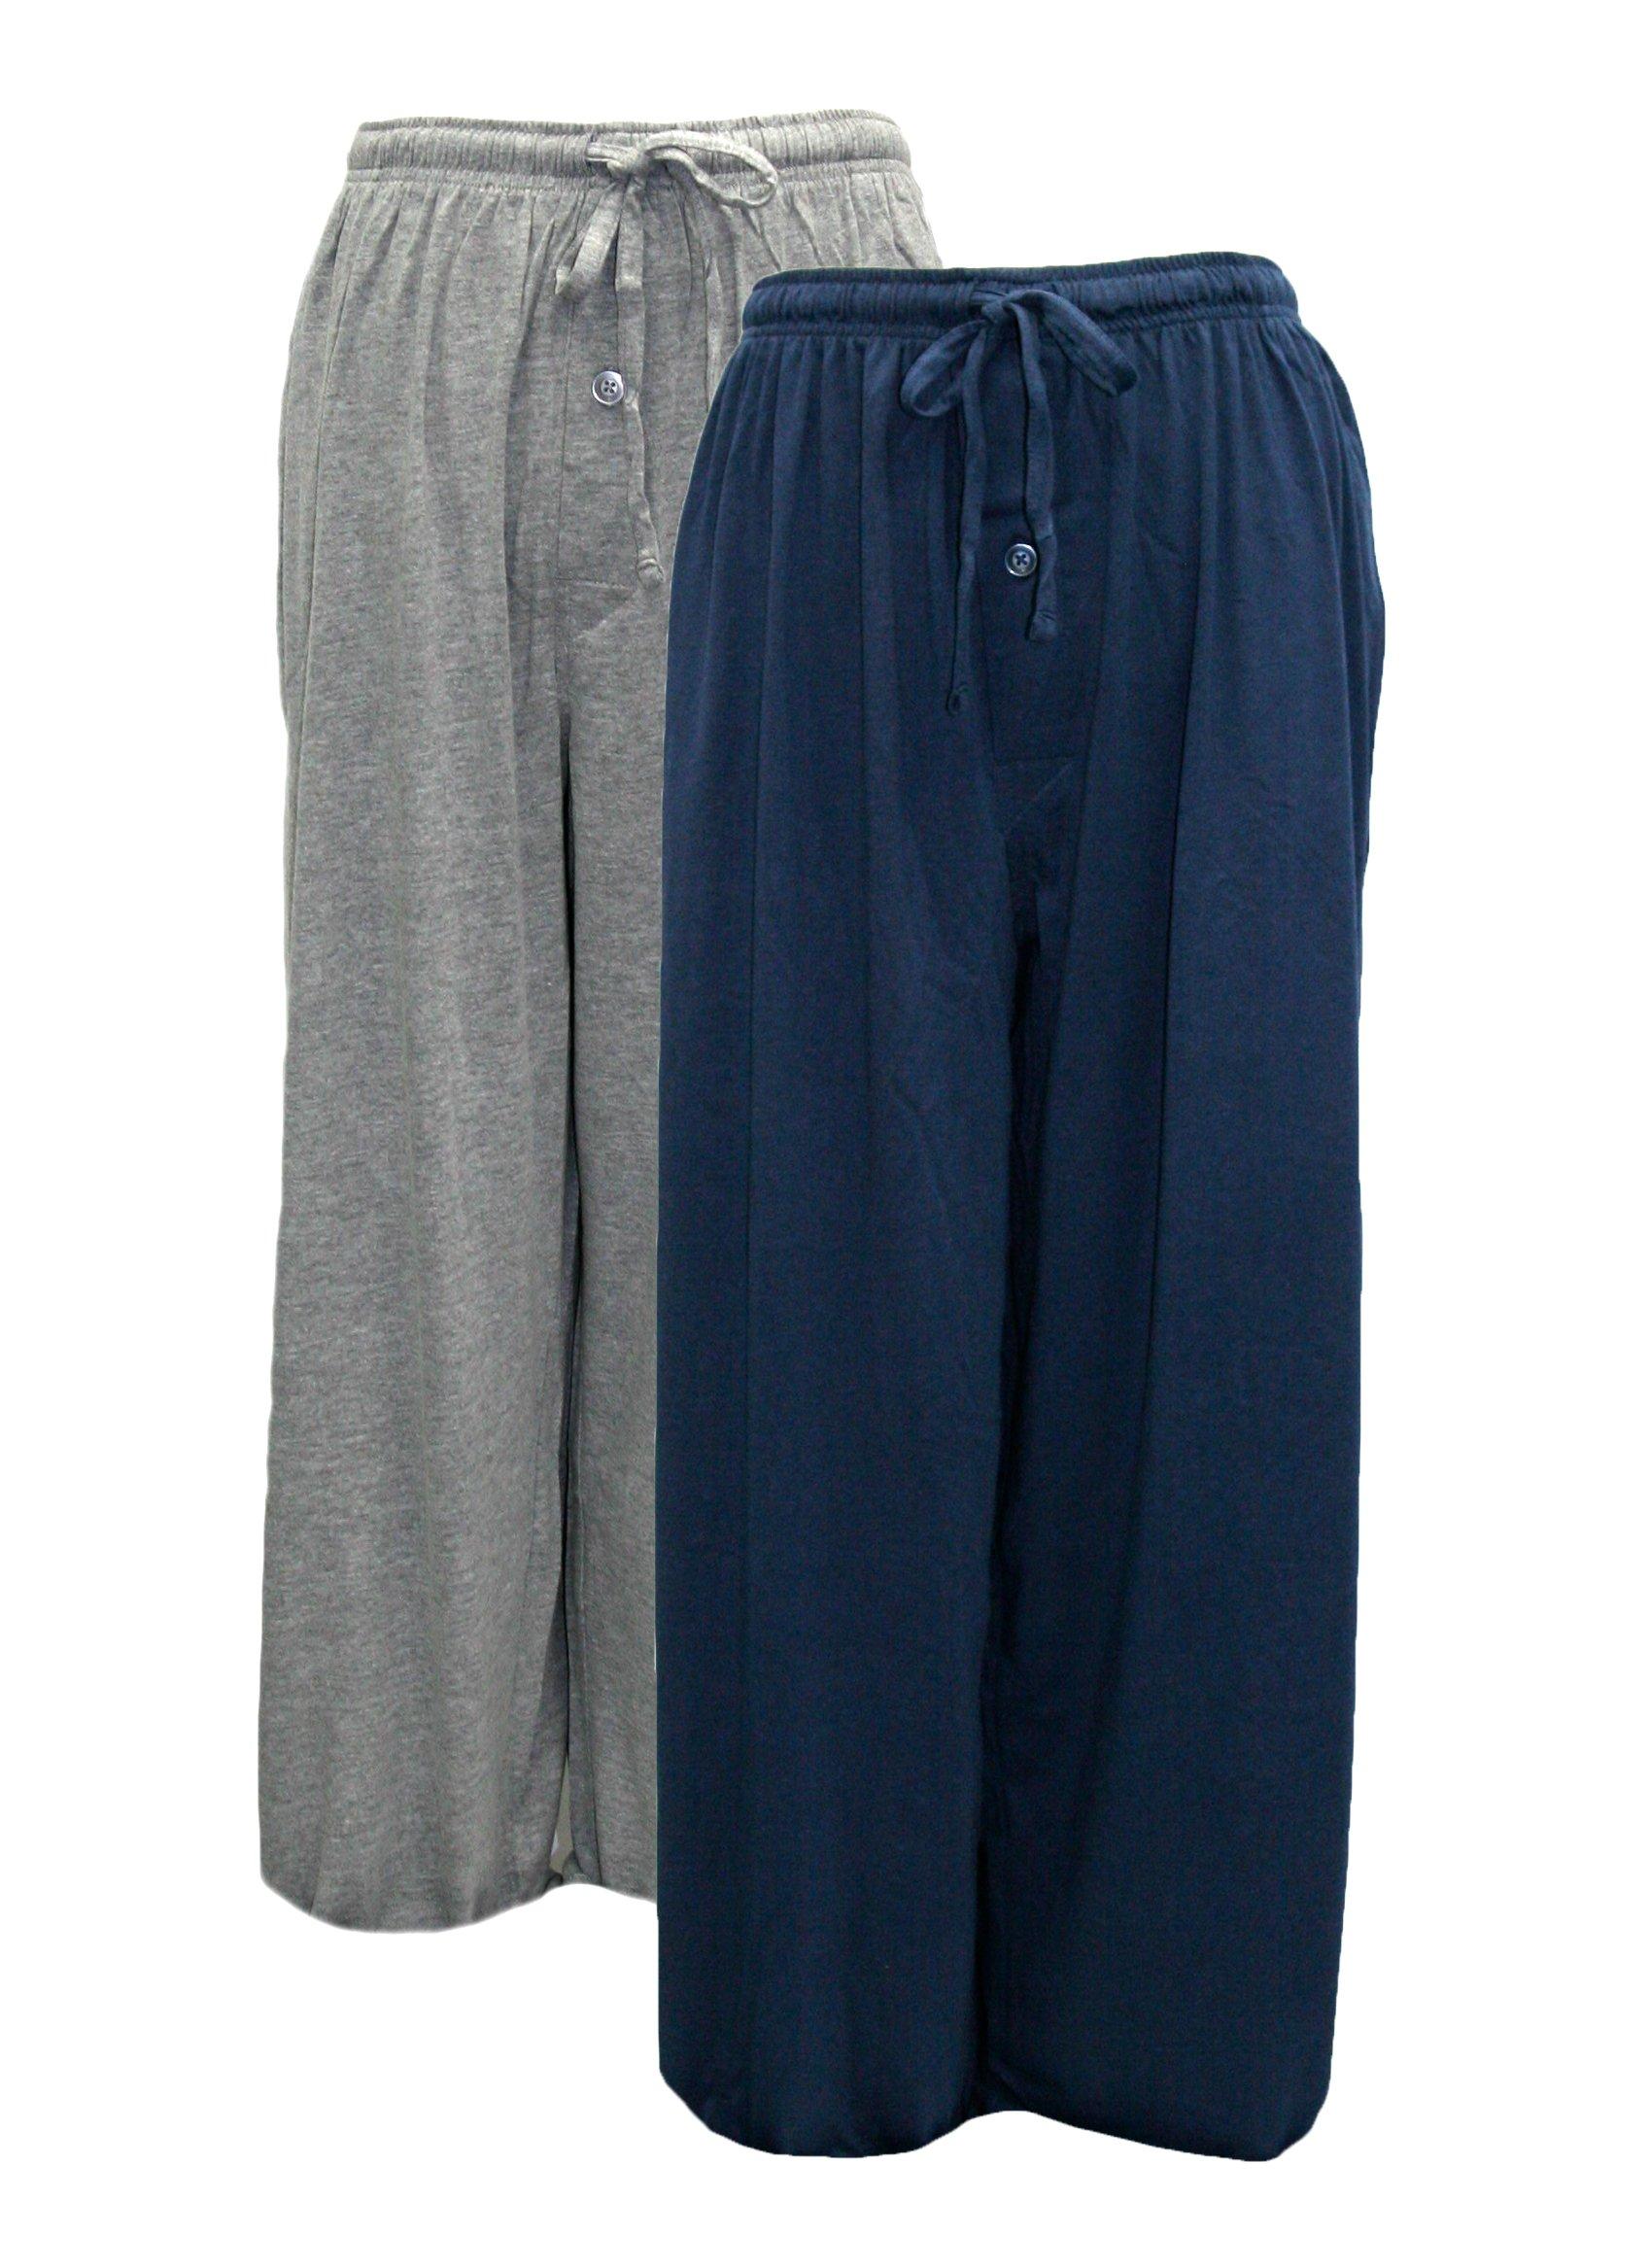 Fruit of the Loom Men's 2-Pack Jersey Knit Pajama Pant Set (Navy/Grey, 5X-Large)